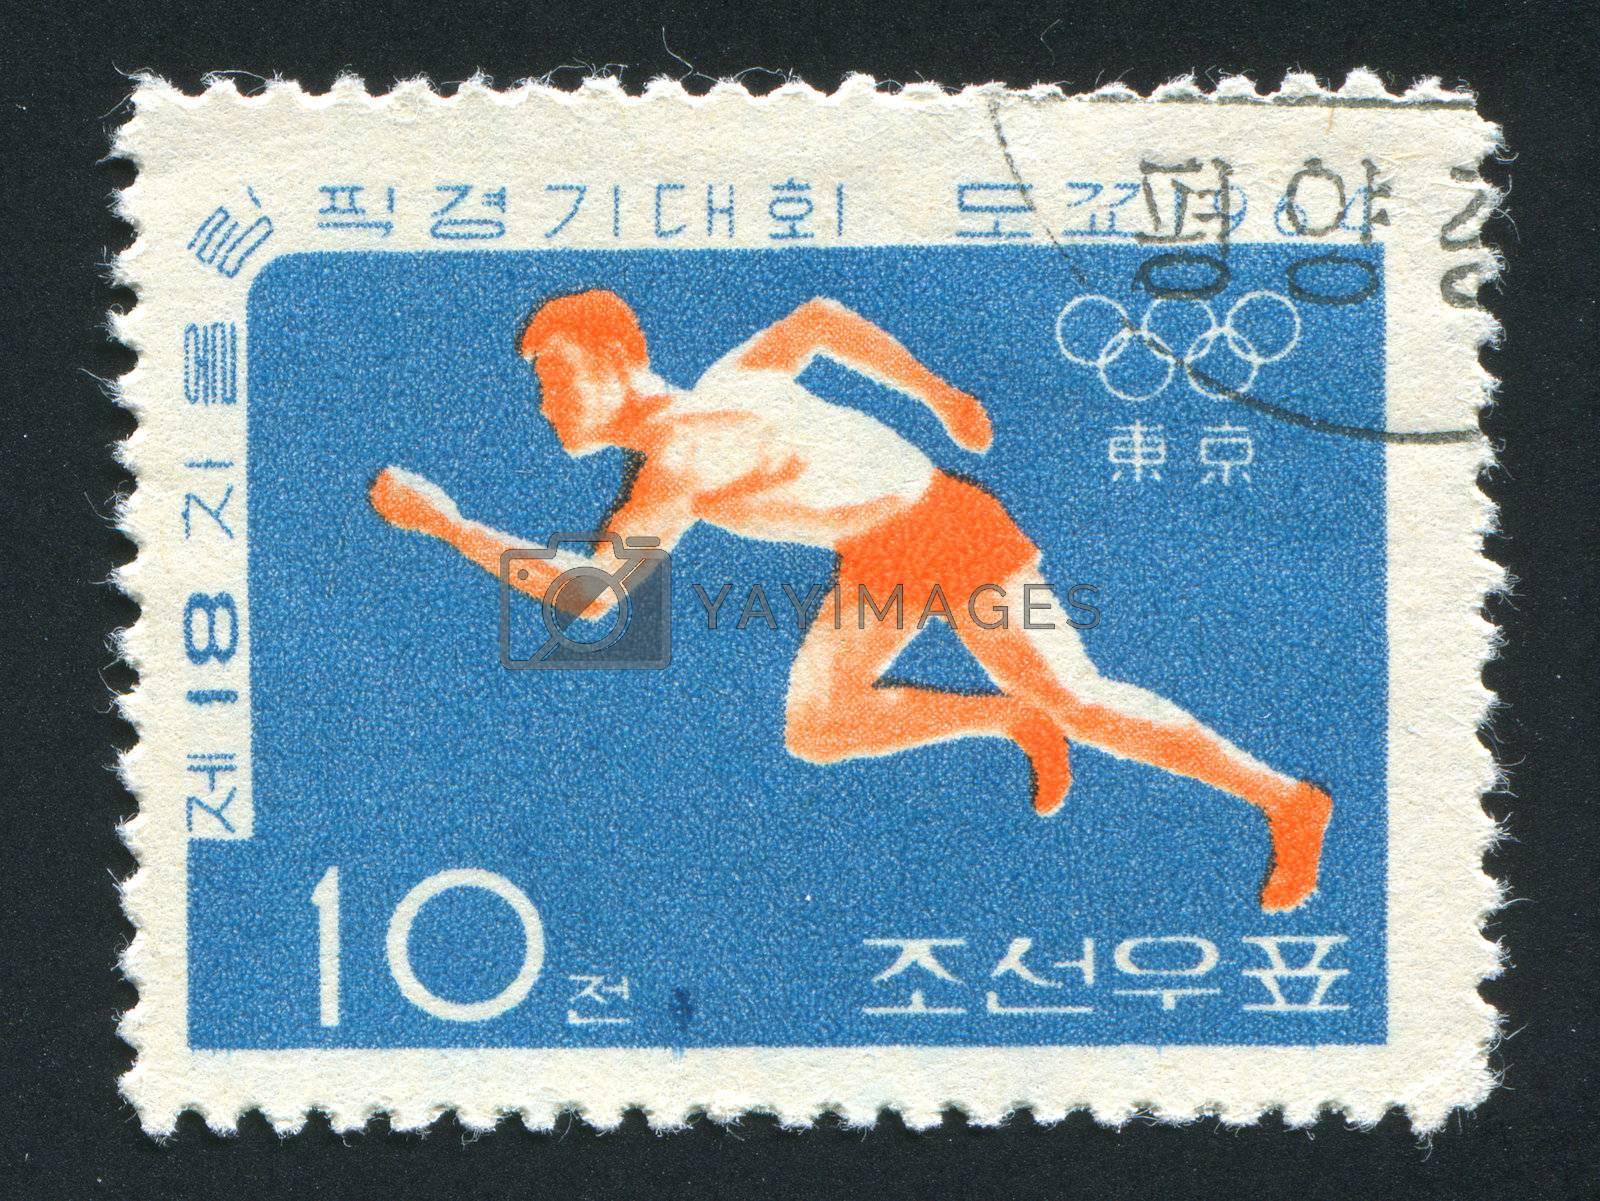 NORTH KOREA - CIRCA 1964: 18th Olympic Games, Tokyo, circa 1964.